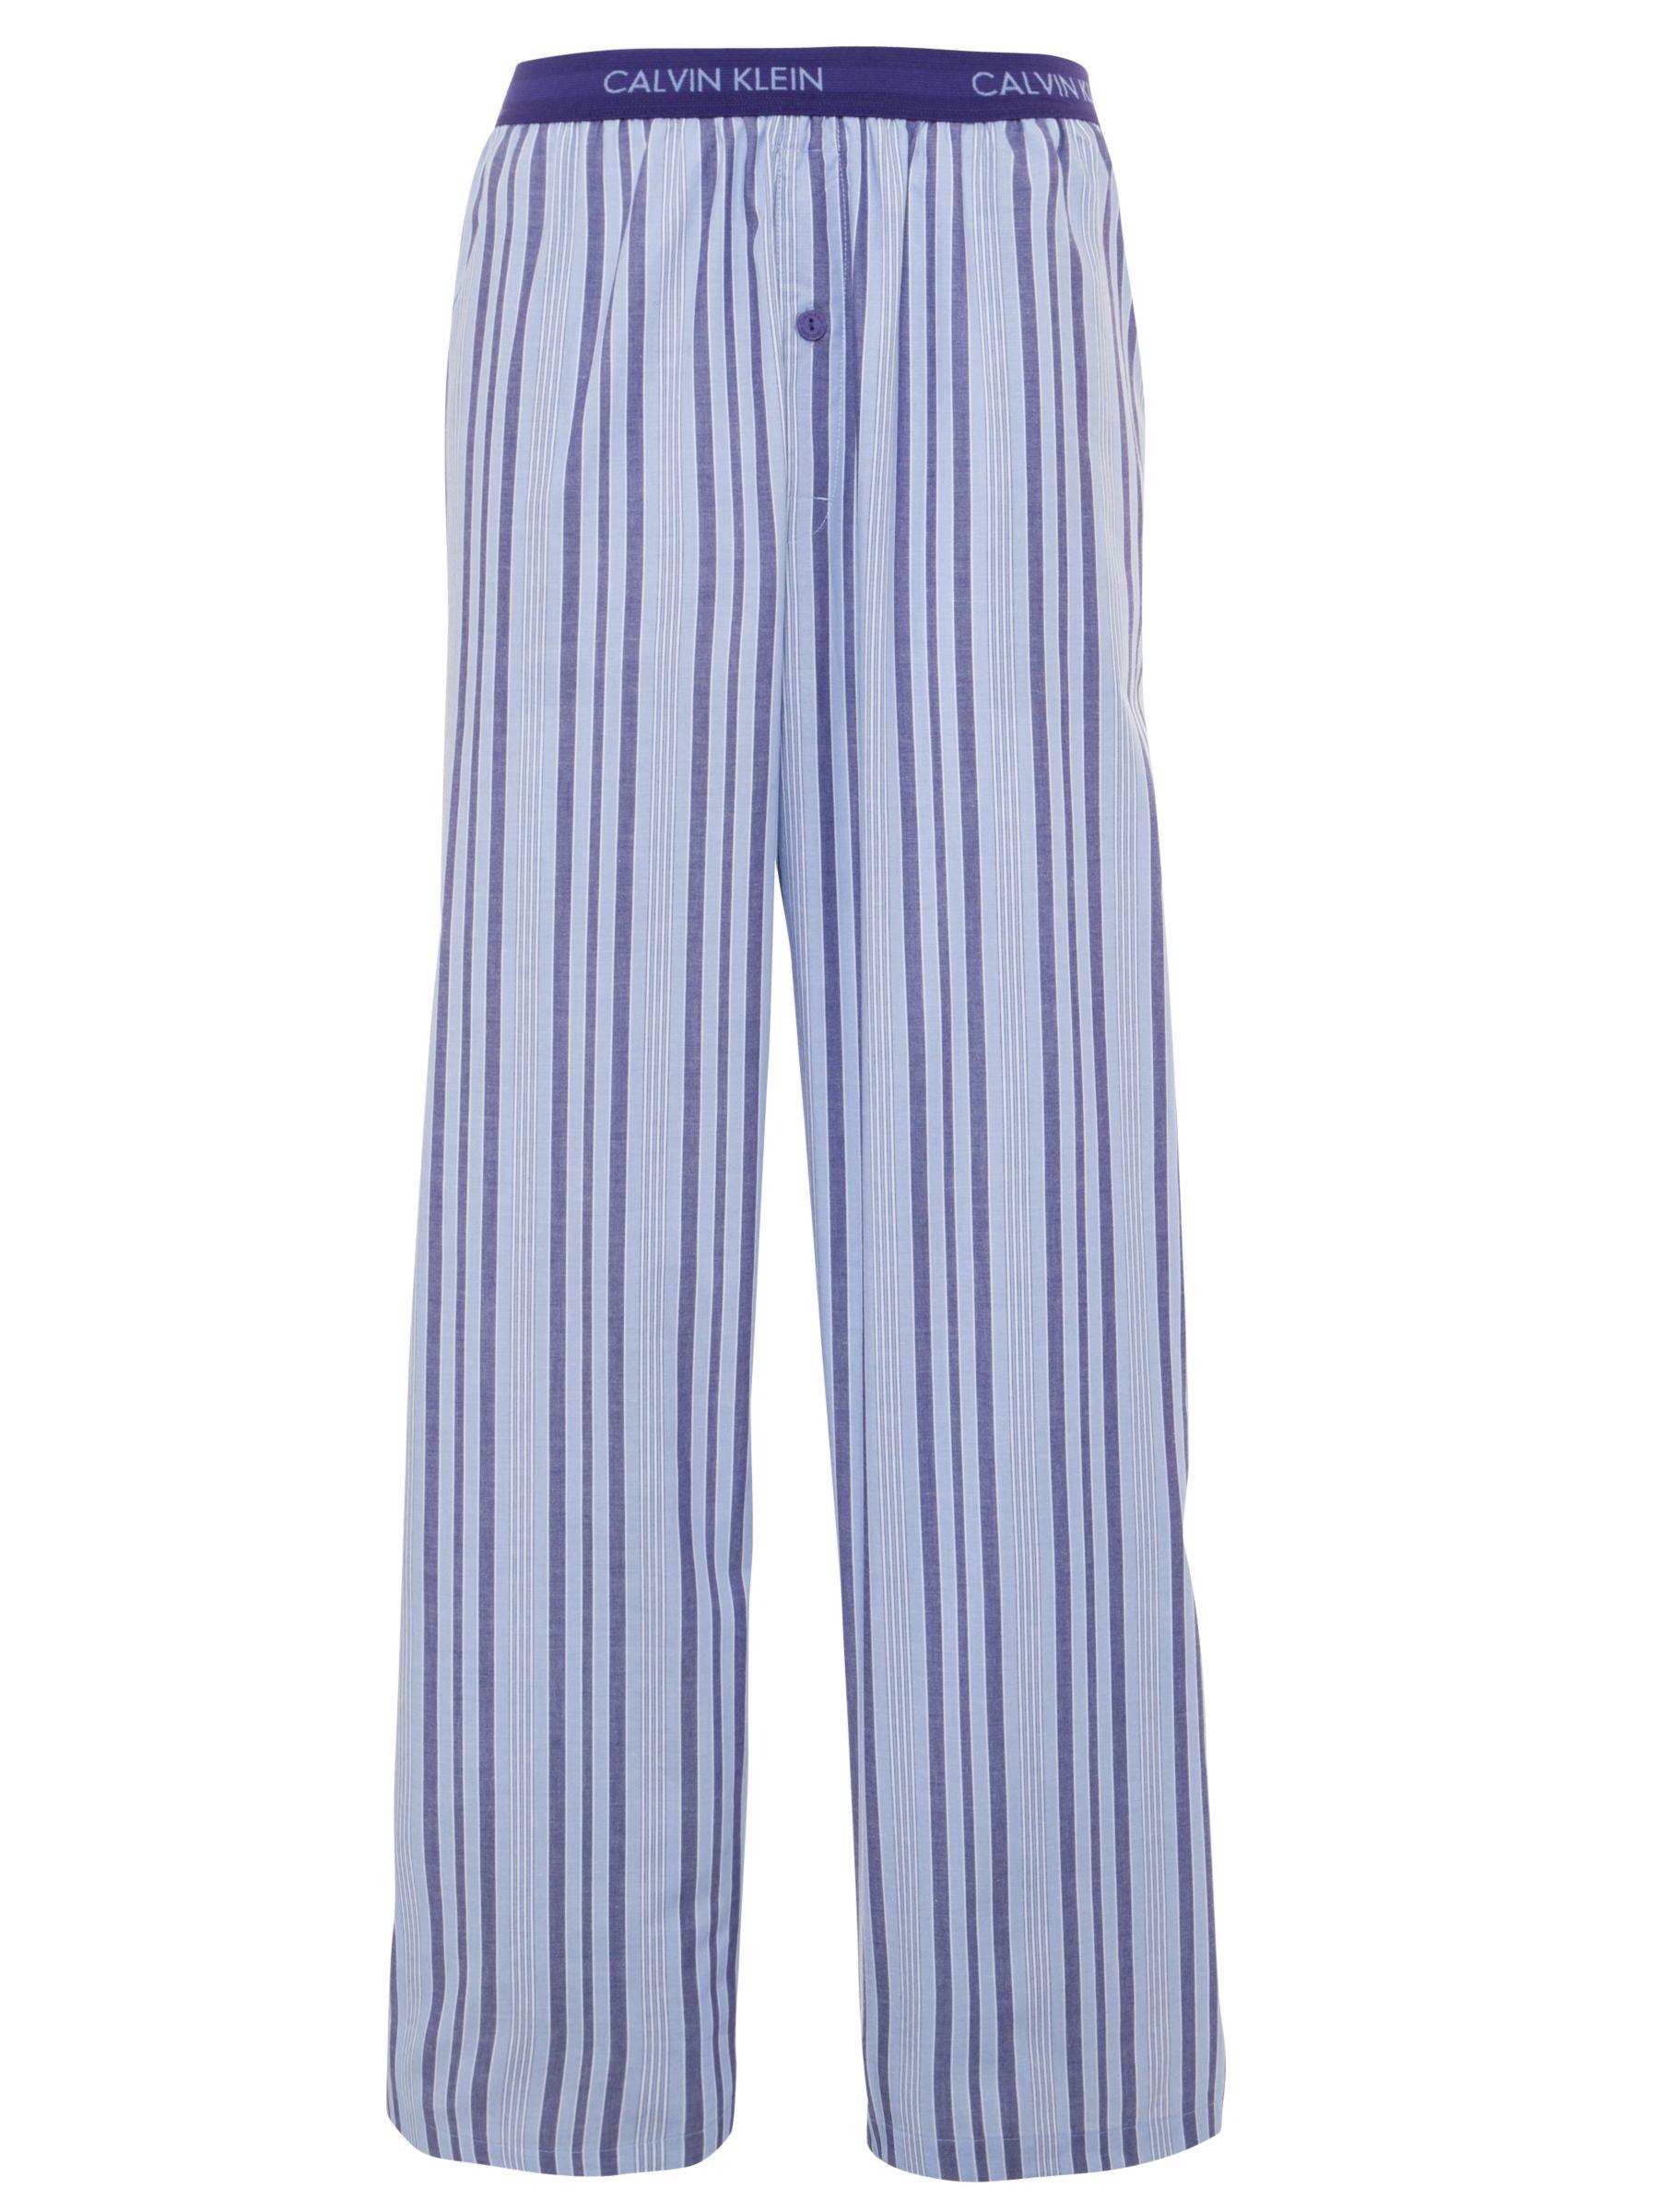 Calvin Klein Woven Lounge Pant